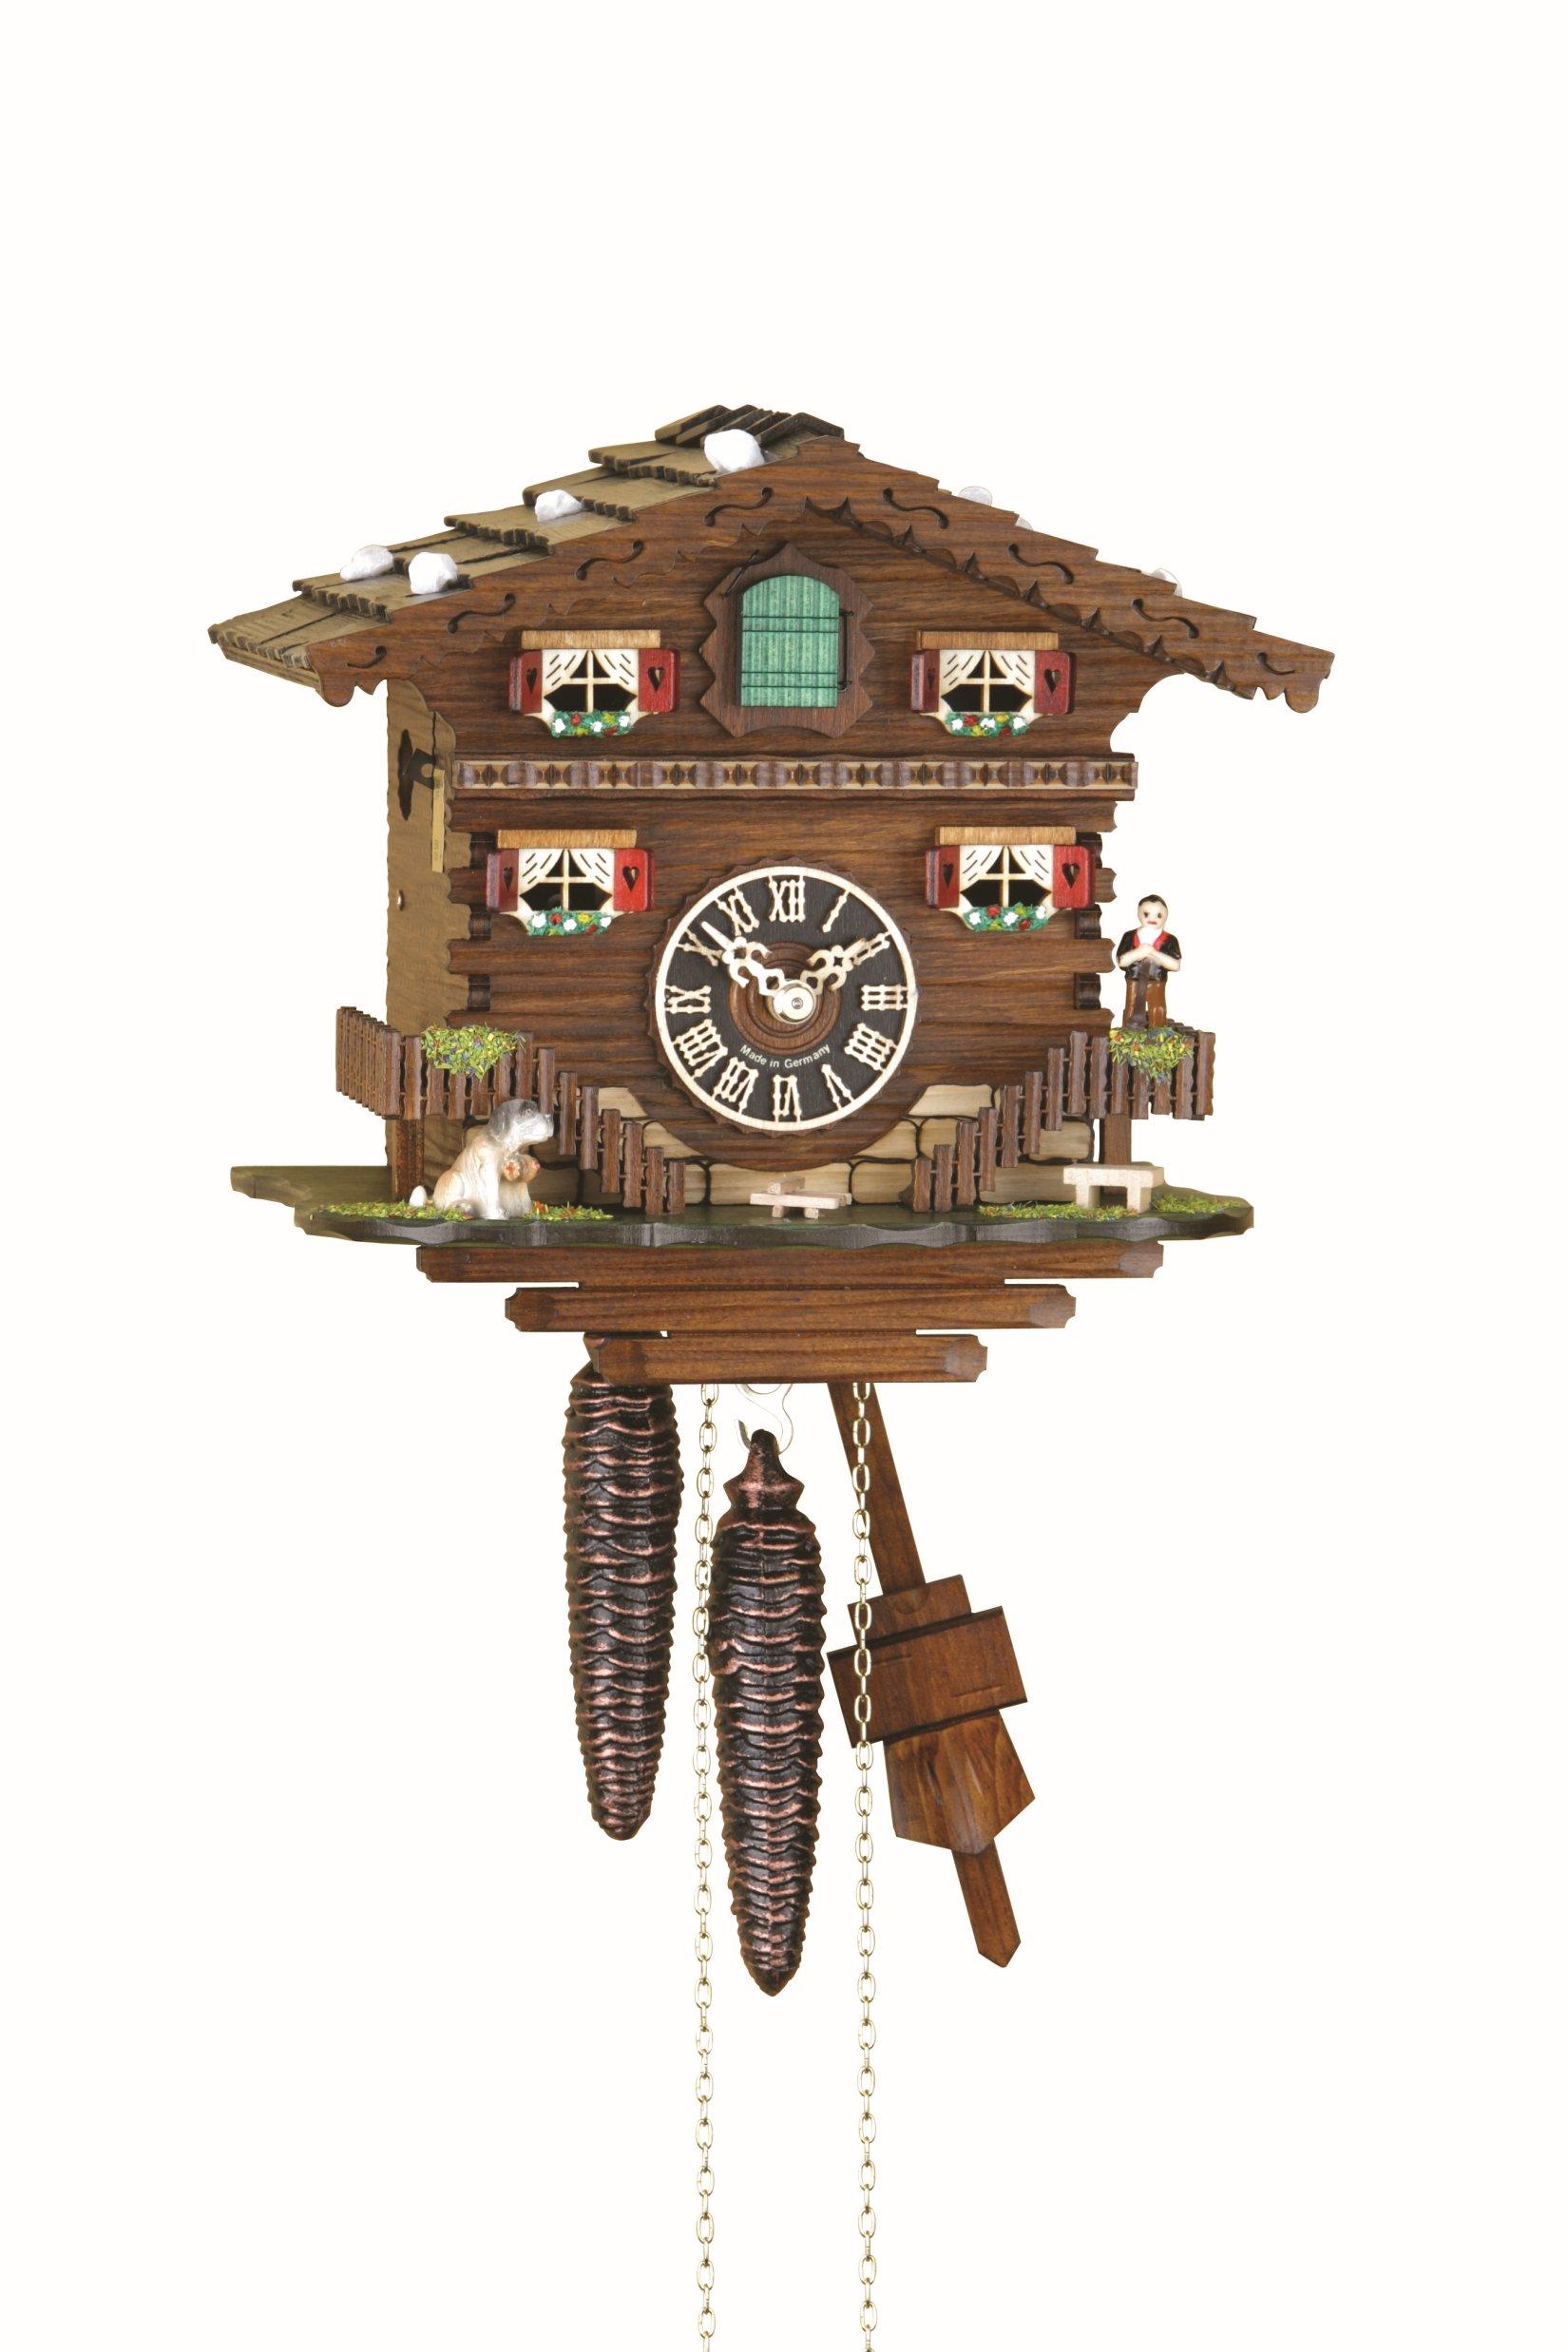 Cuckoo Clock Bad Ragaz with 1-day-movement